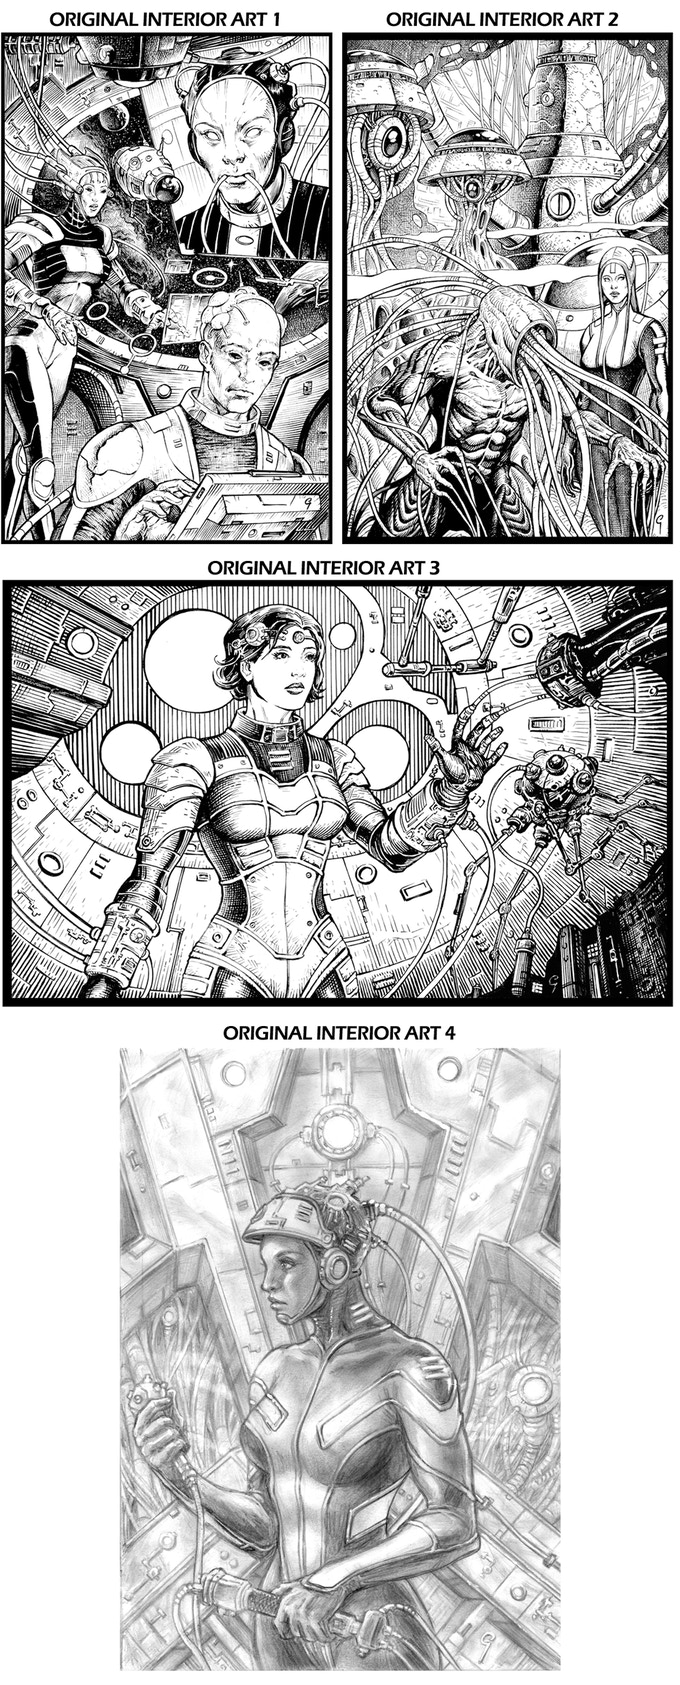 Original Interior Art Rewards